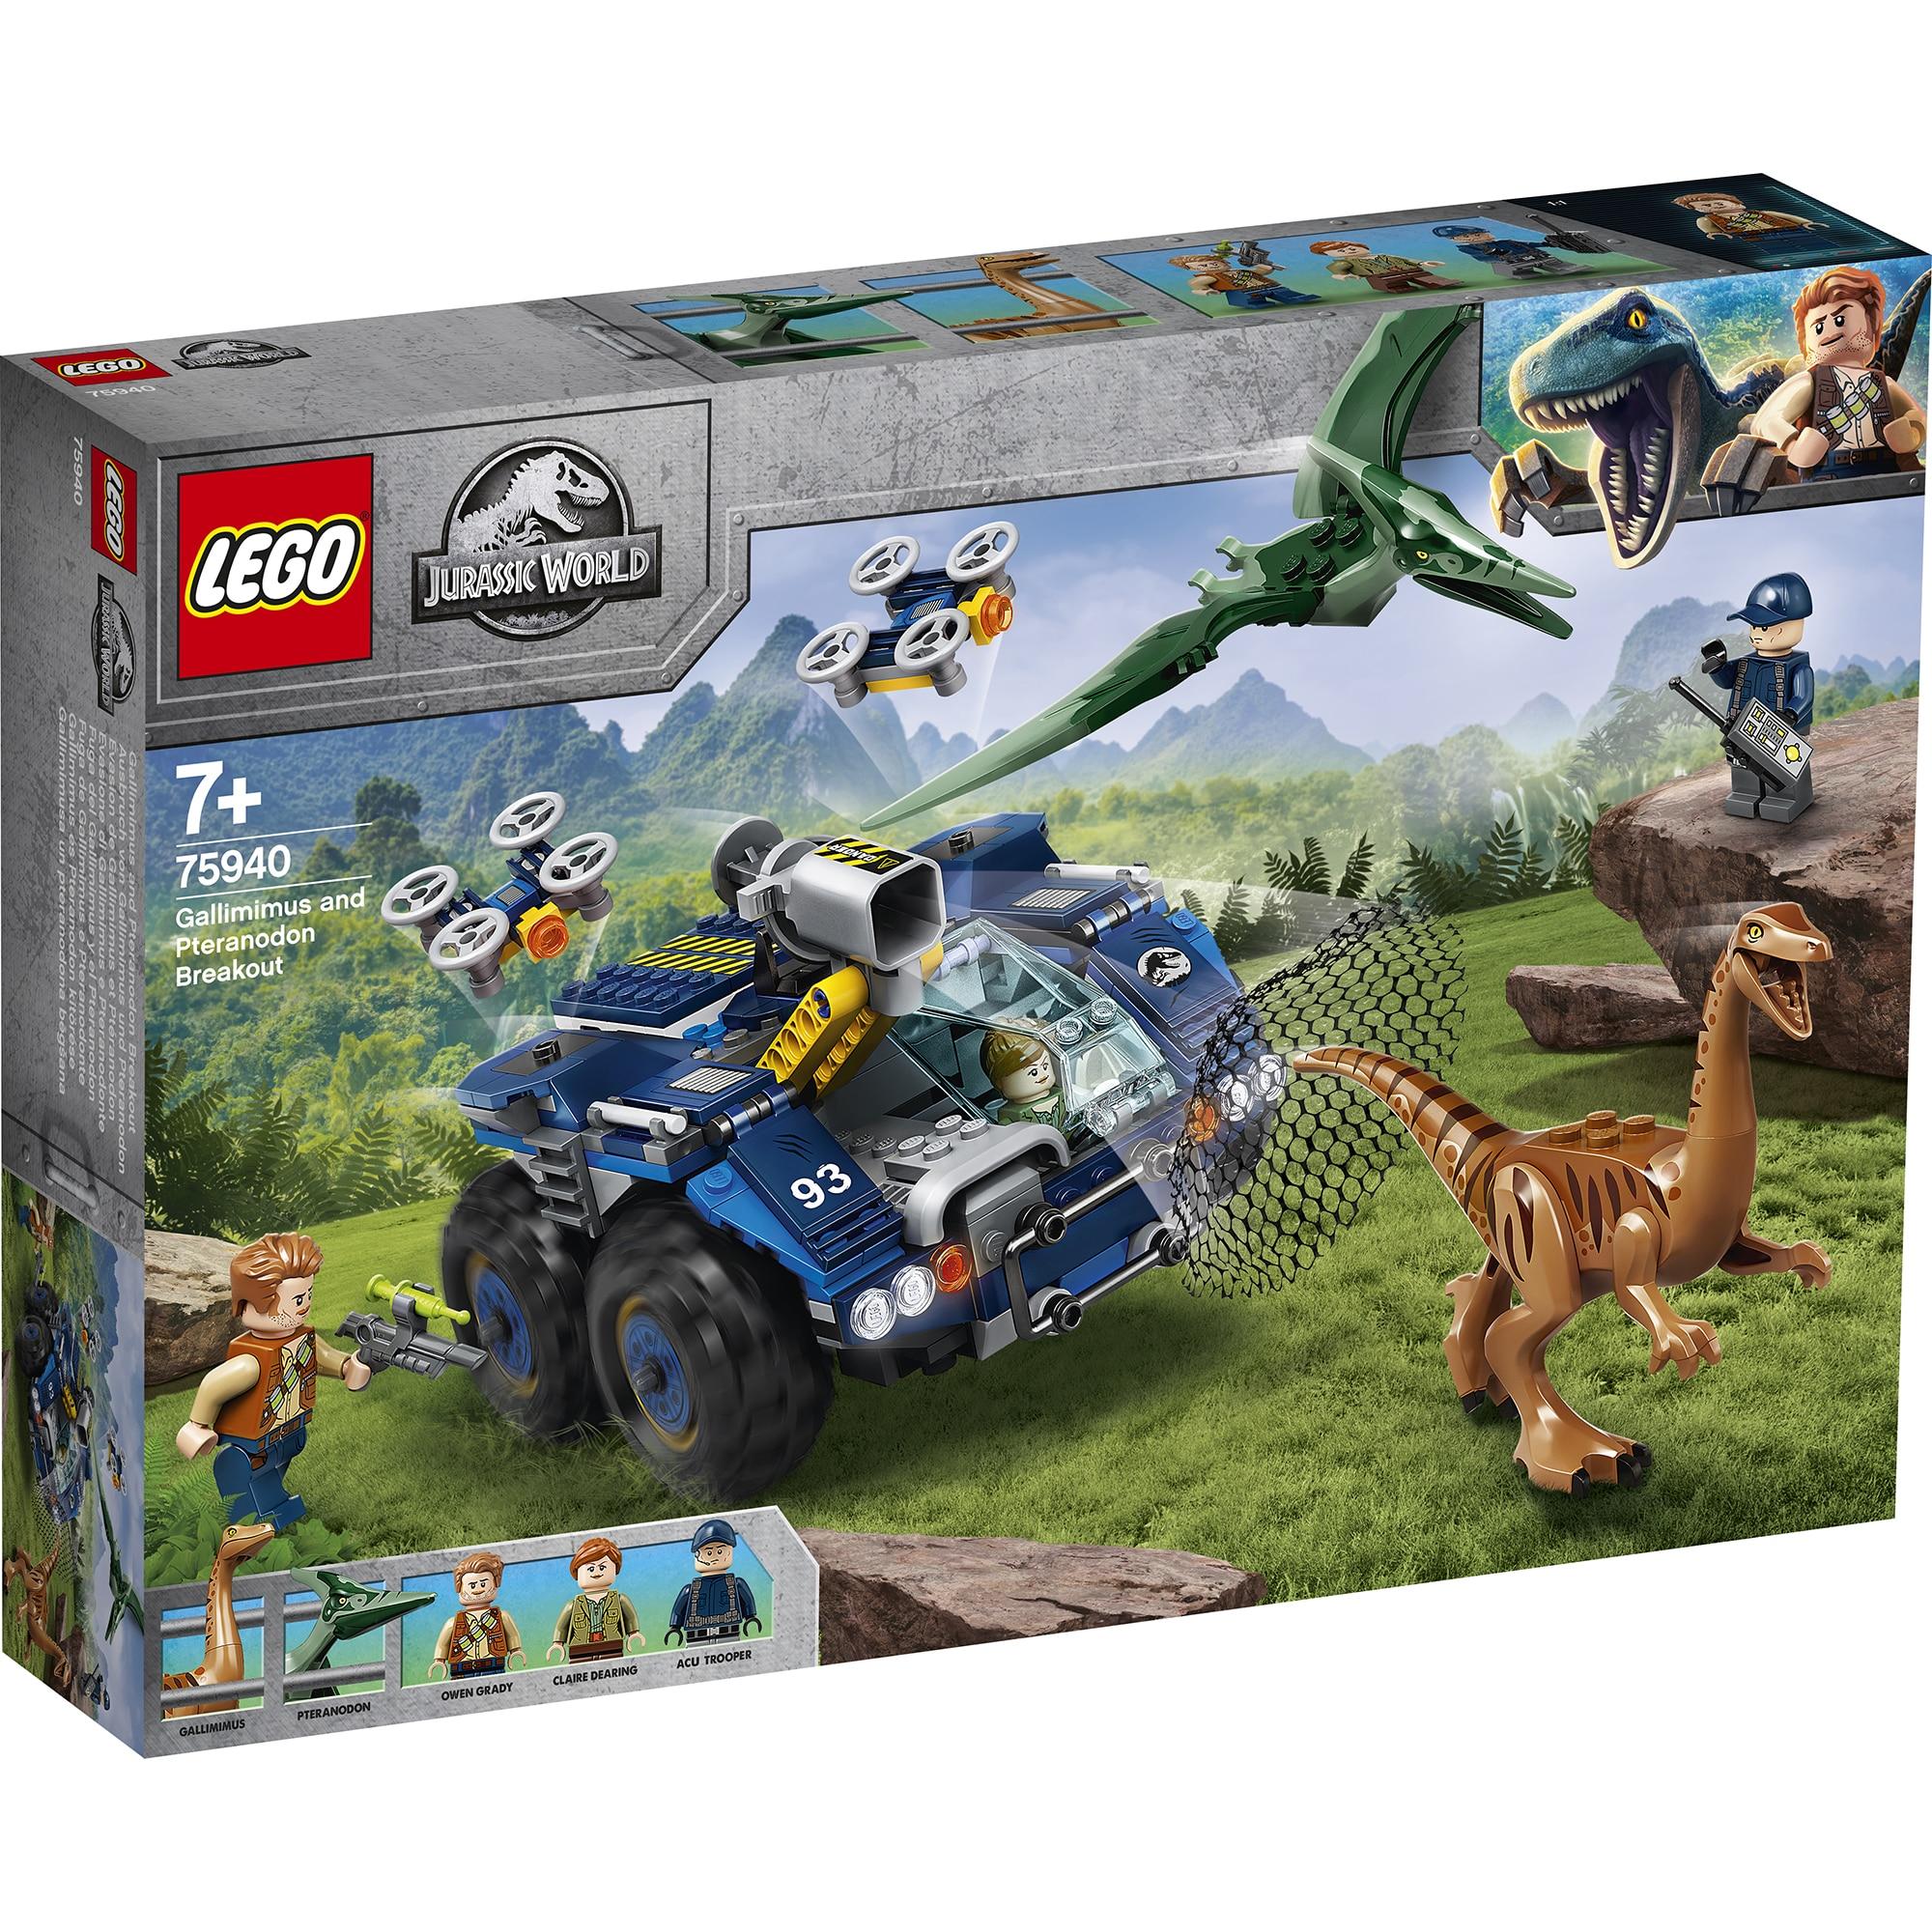 Fotografie LEGO Jurassic World - Evadarea lui Gallimimus si Pteranodon 75940, 391 piese